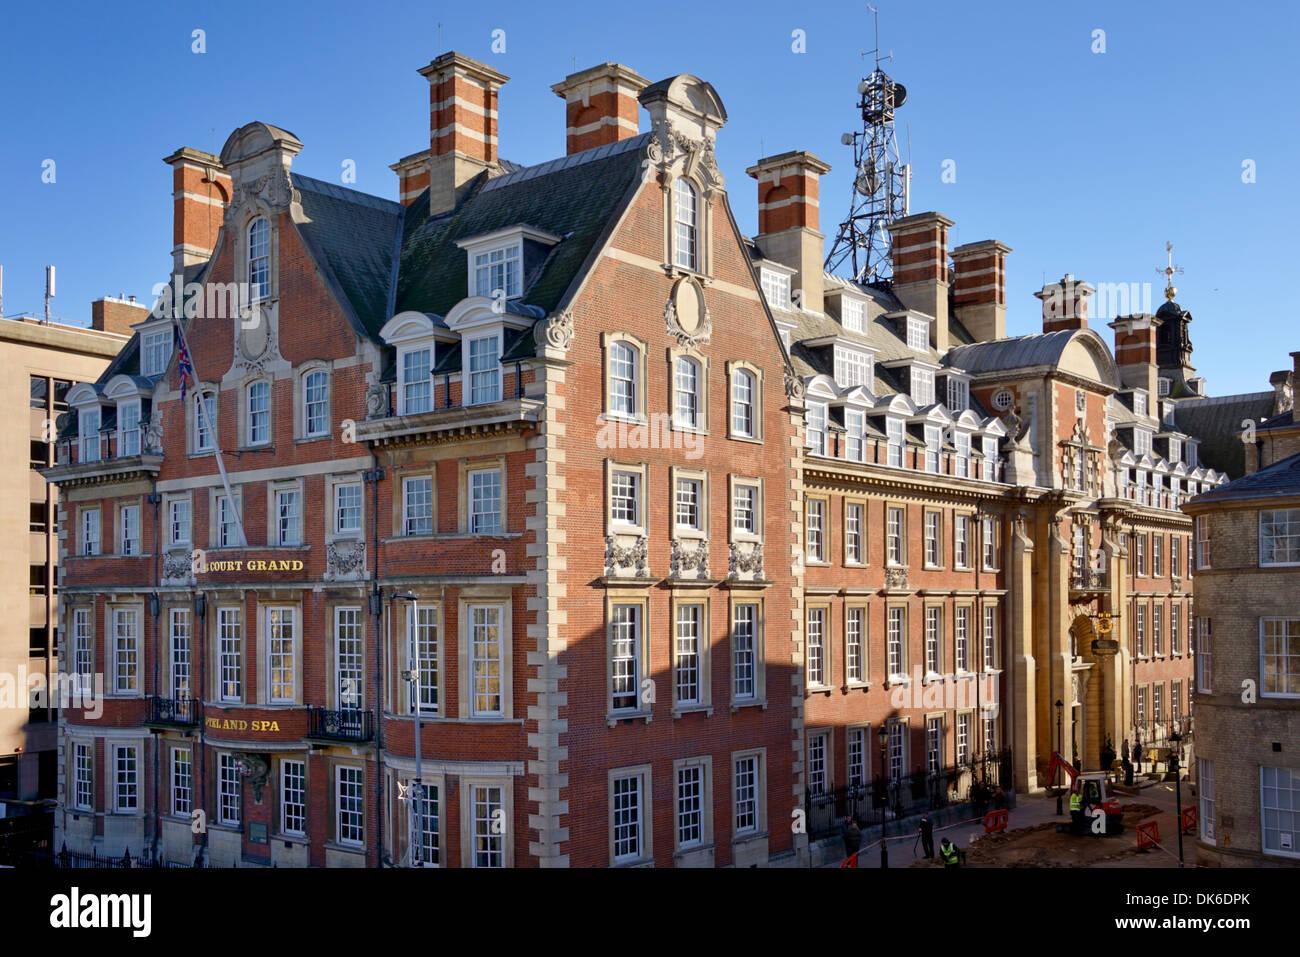 Cedar Court Grand Hotel & Spa, York, Yorkshire, England, United Kingdom, Europe - Stock Image